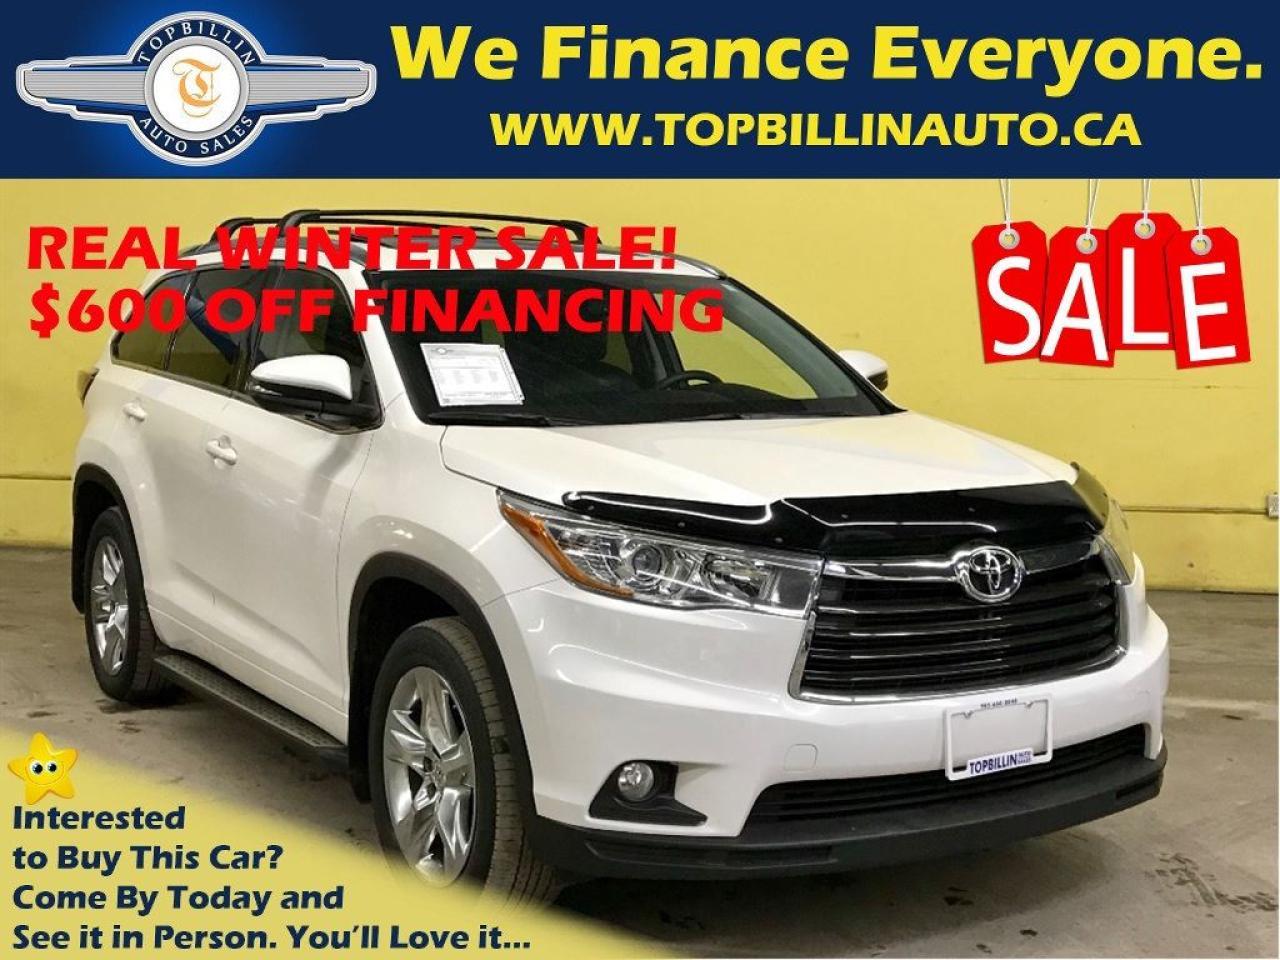 2014 Toyota Highlander Limited, 4 YEARS Premium Warranty, Fully Loaded